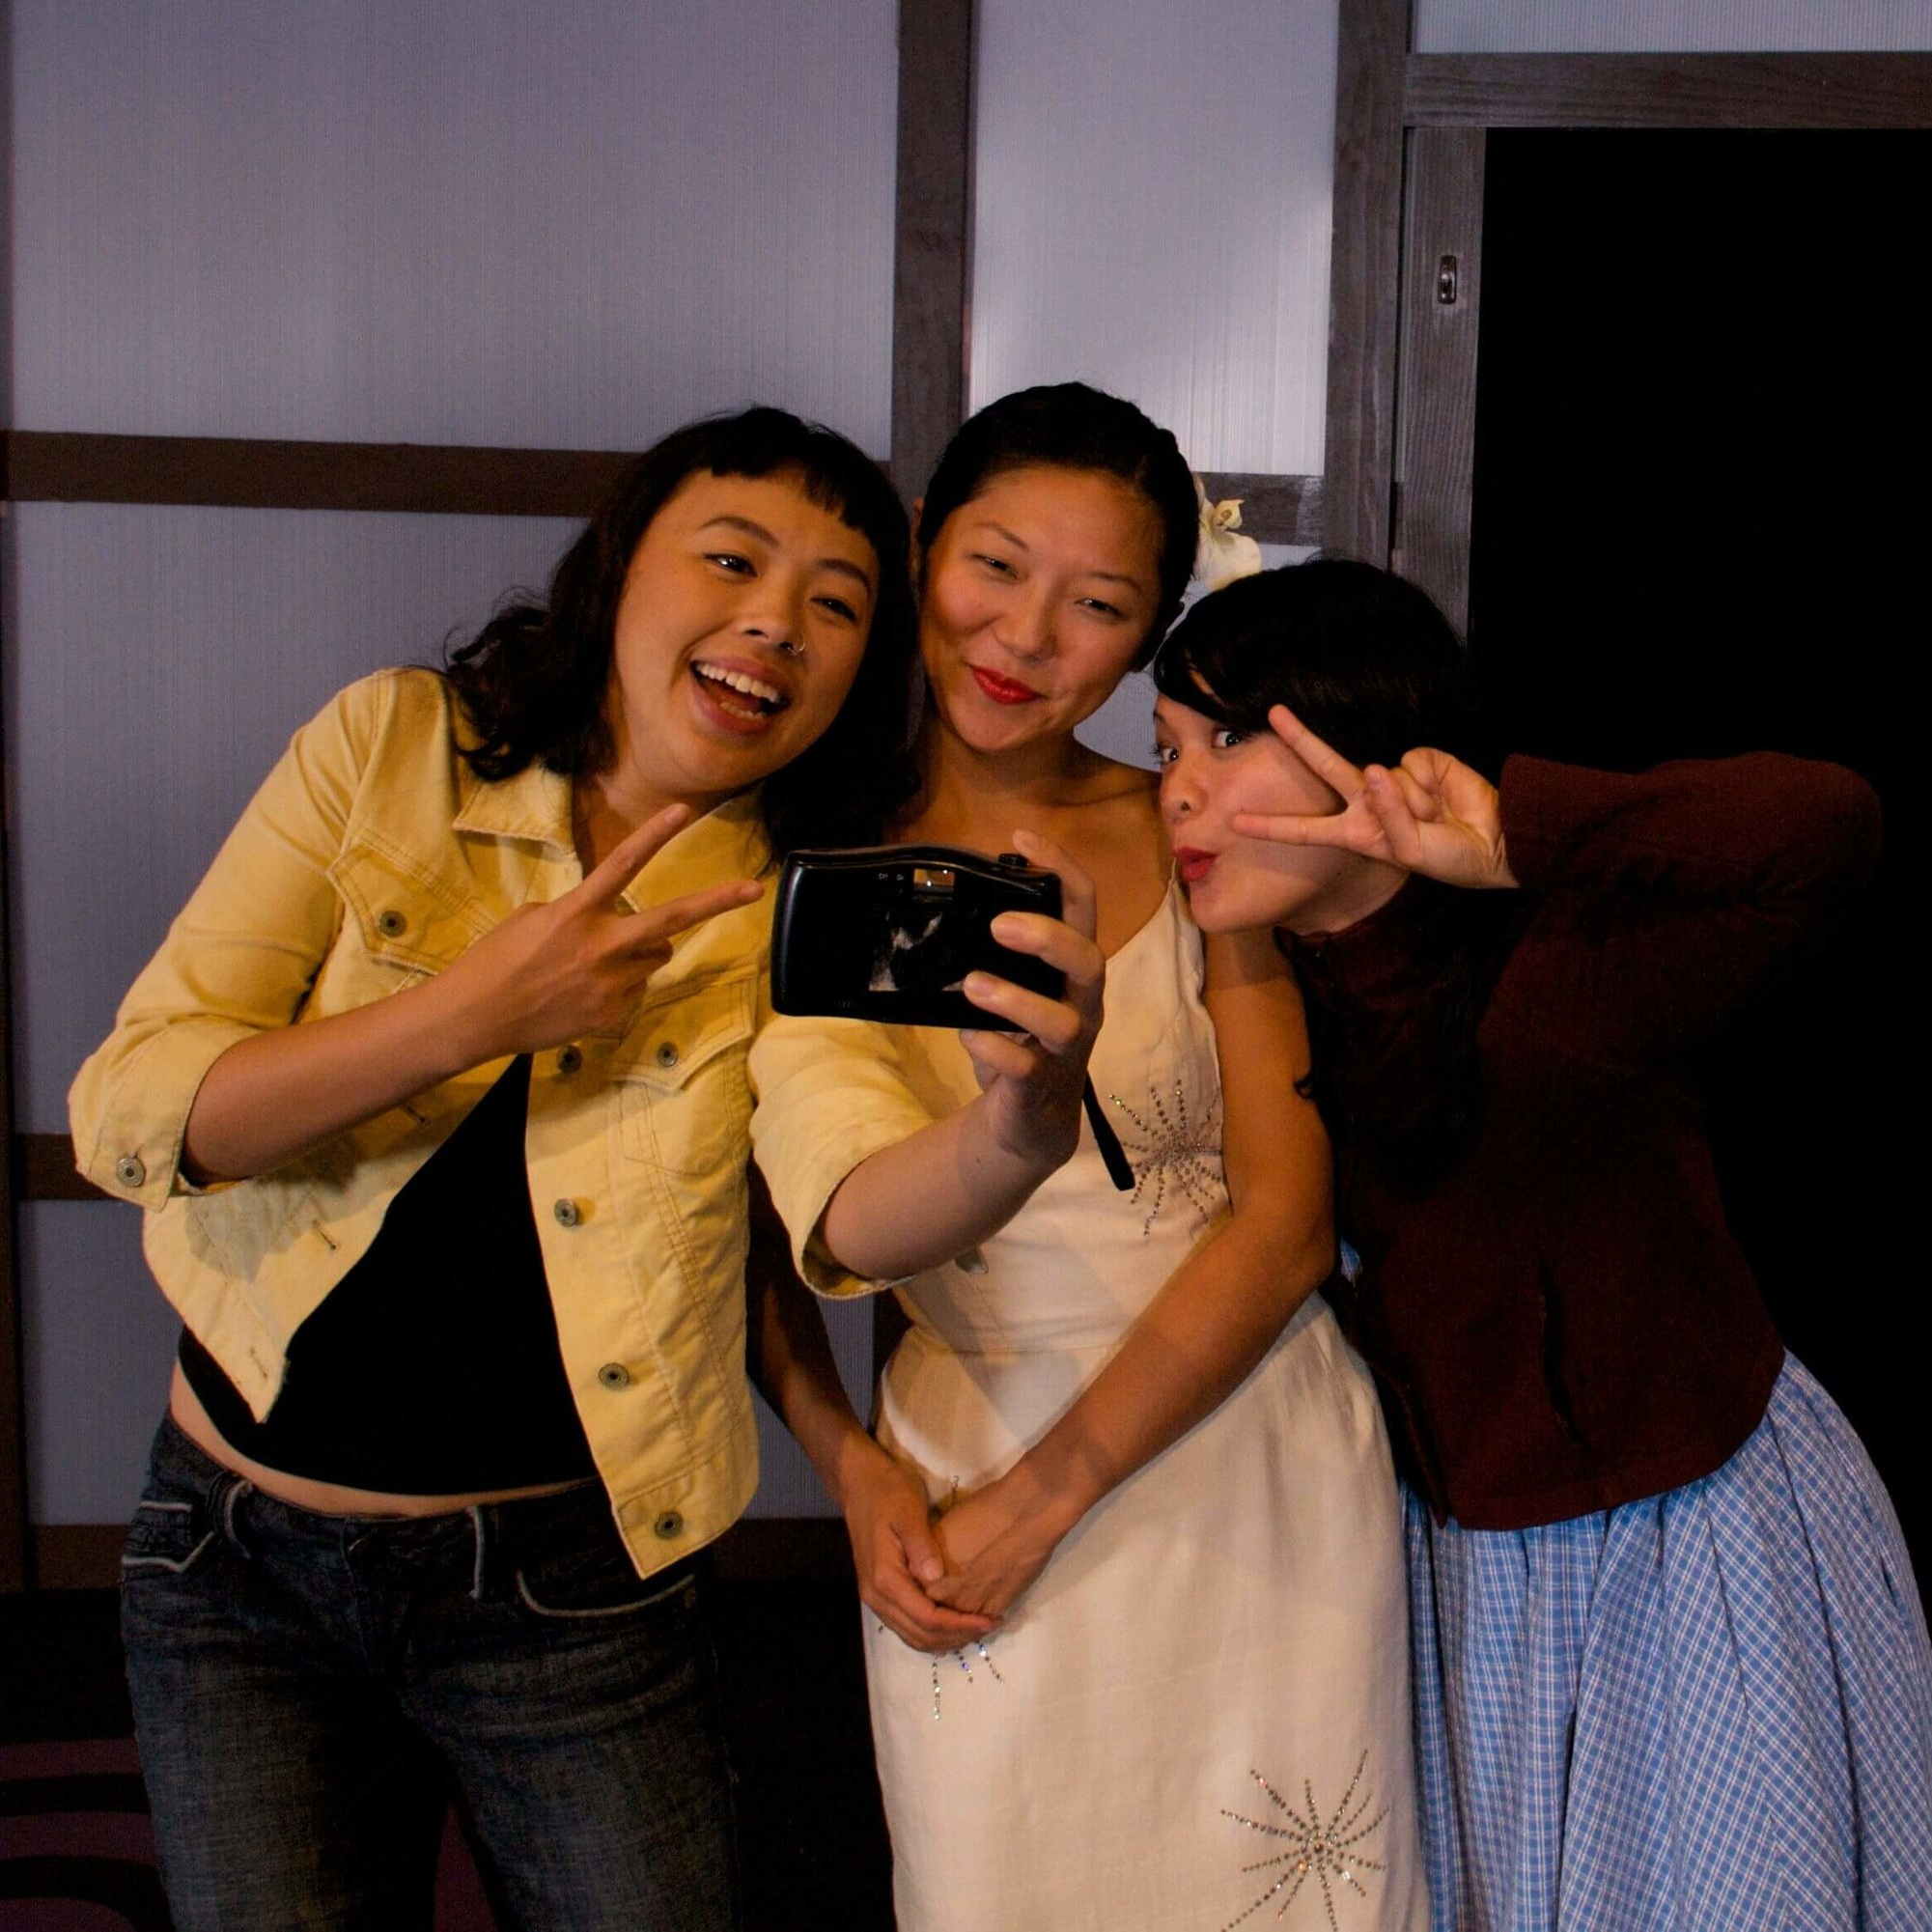 UNDER THE PORCELAIN MASK: ASIAN AMERICAN WOMEN SPEAK OUT - September 13 - October 5, 2008